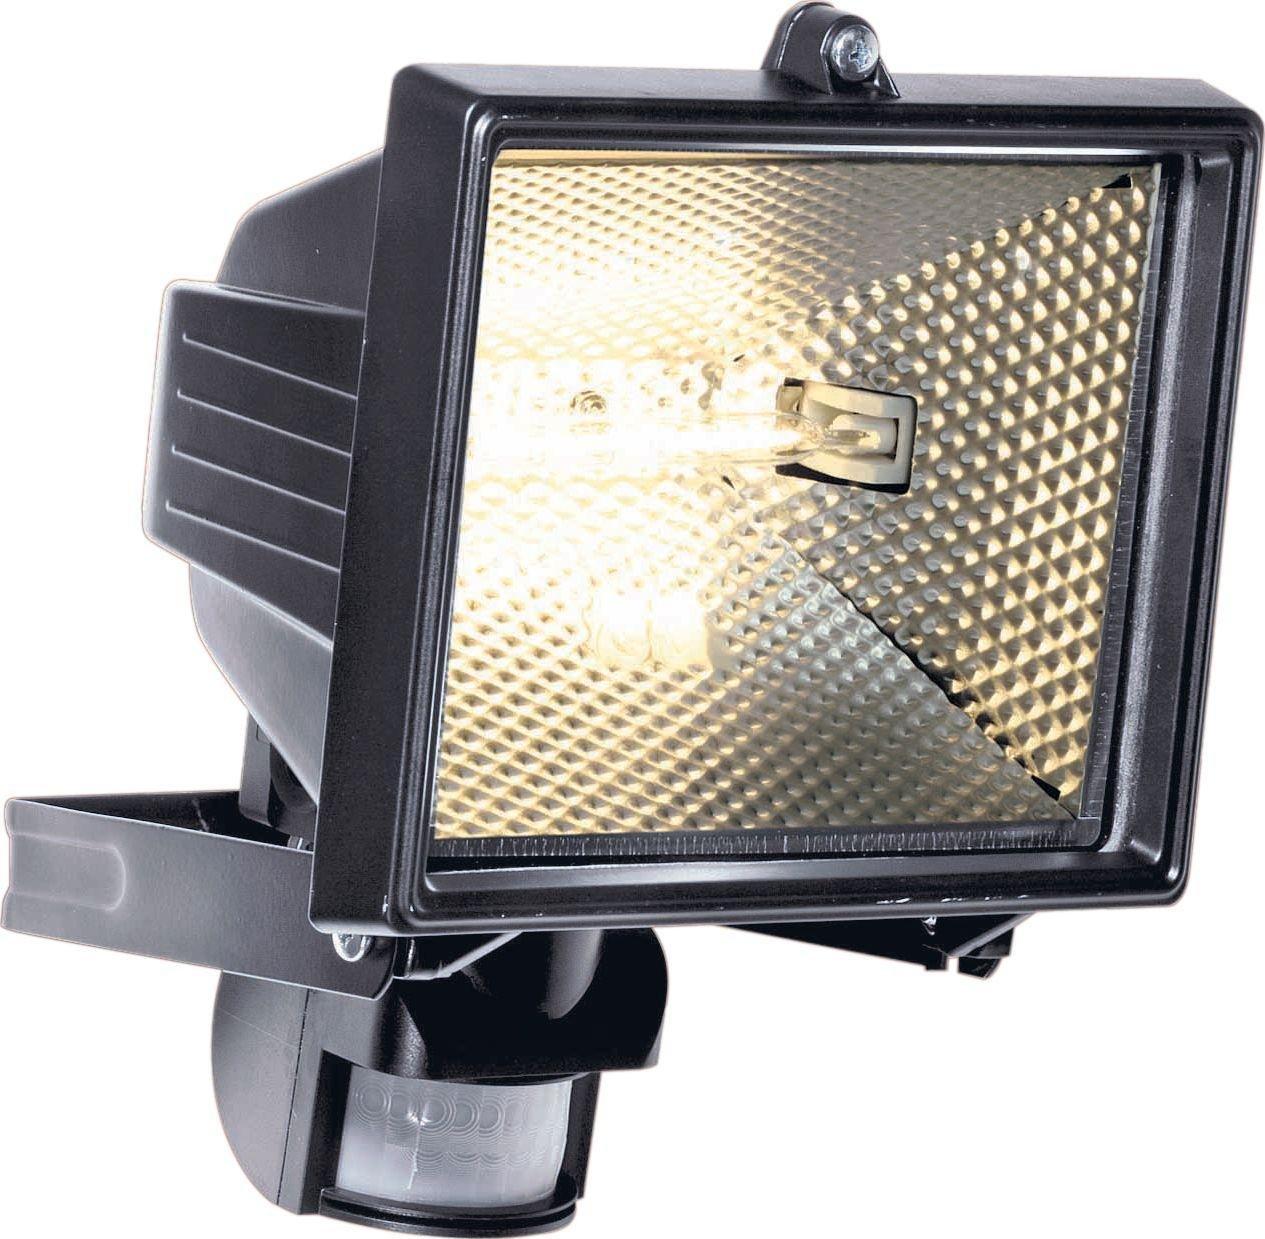 Buy HOME 400 Watts PIR Security Light at Argoscouk Your Online